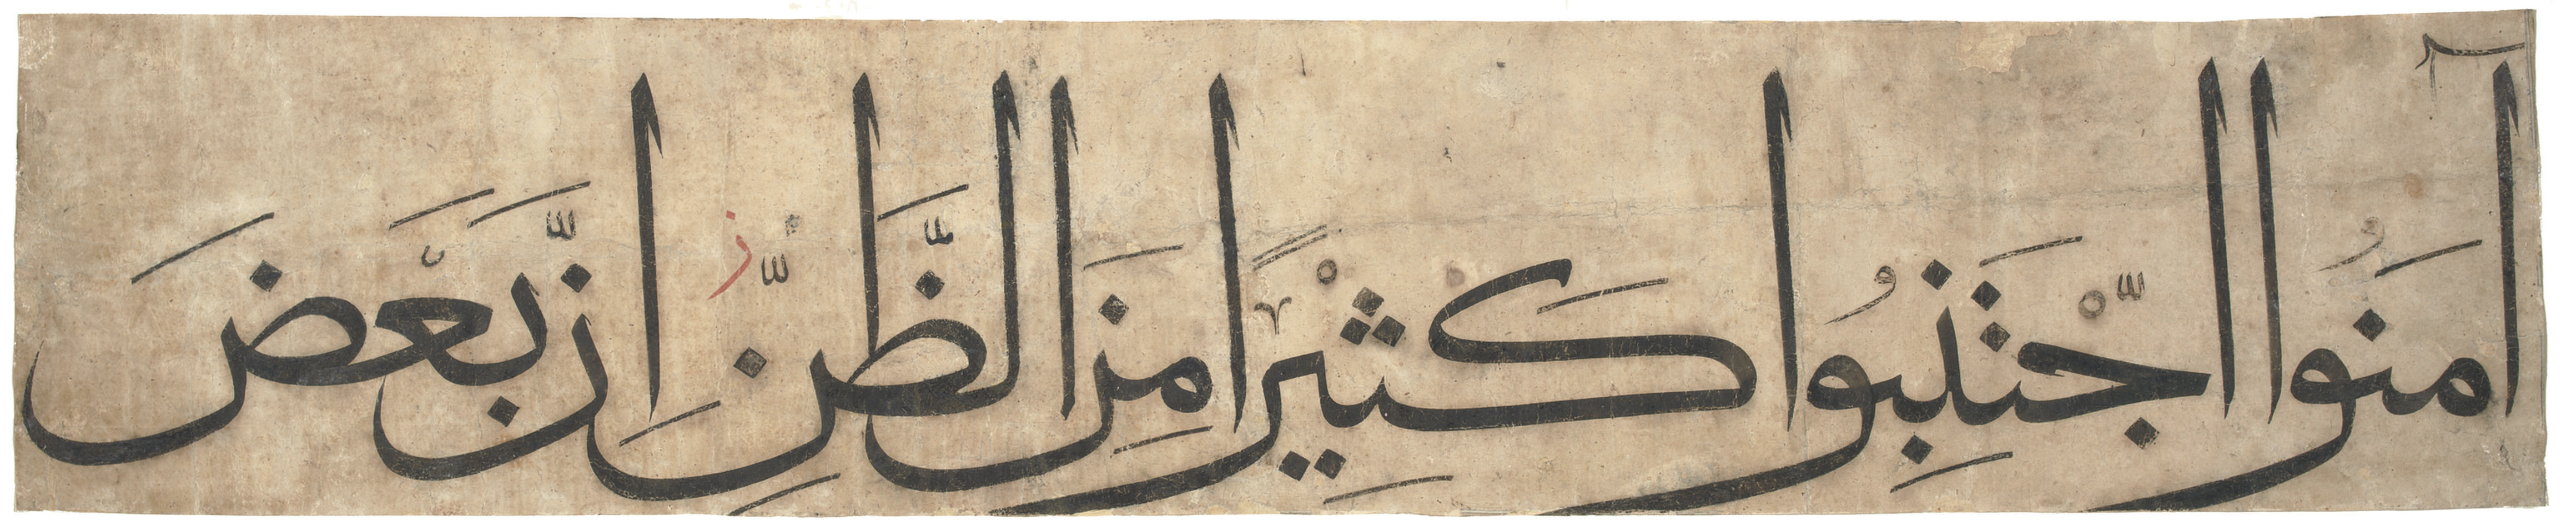 Baysunghur - Baysunghuri Qur'an Manuscript